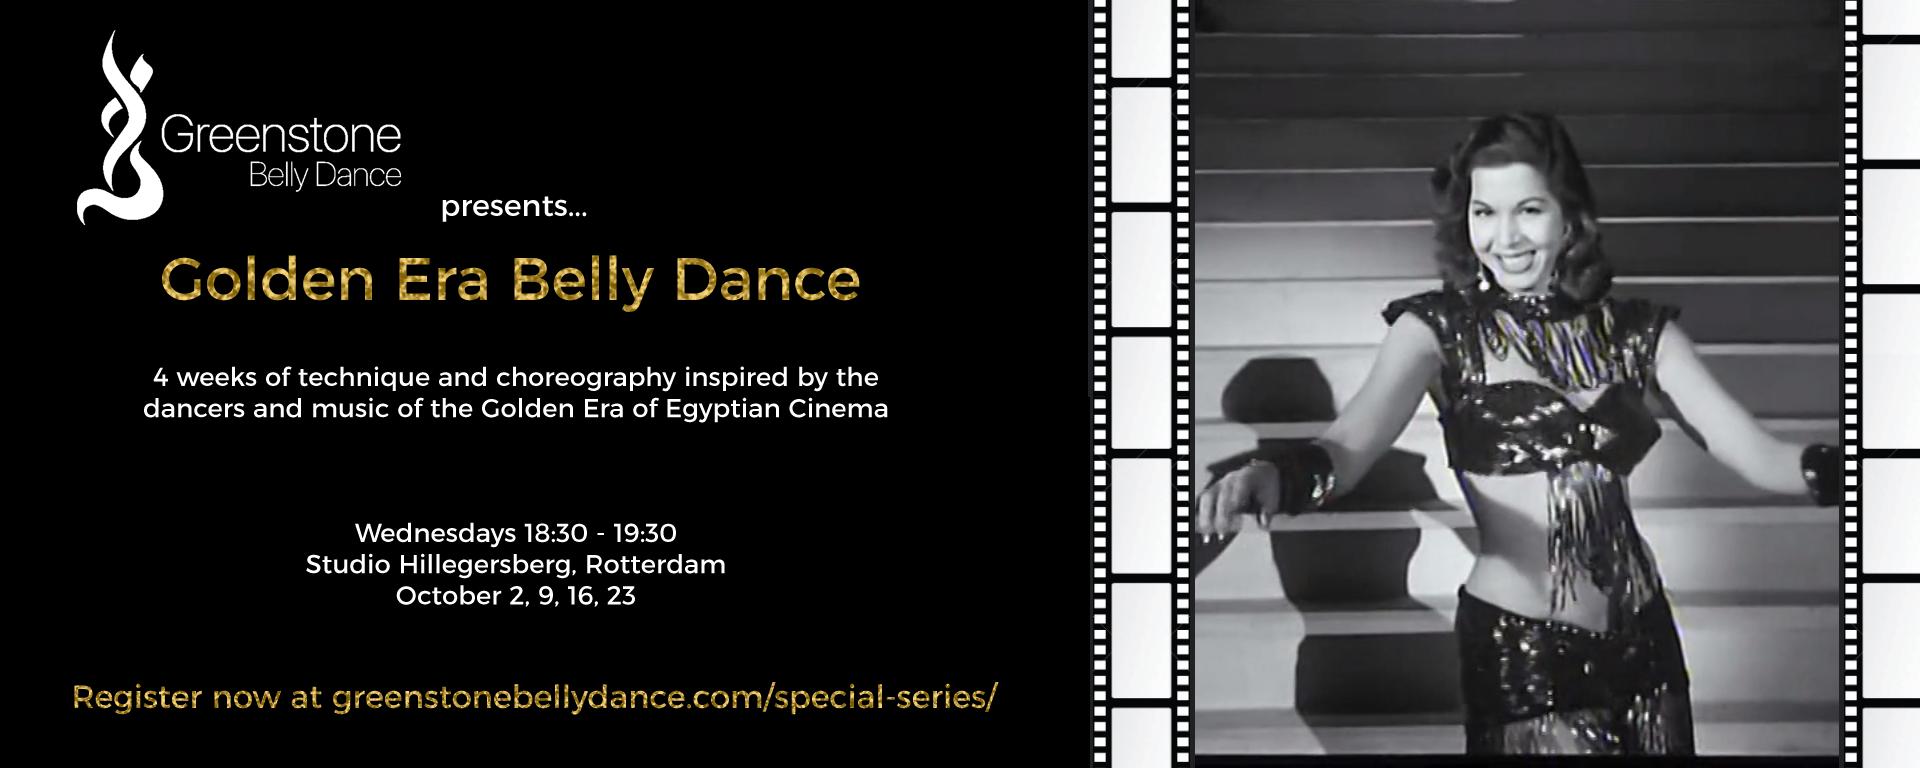 Golden Era Belly Dance in Rotterdam Greenstone Belly Dance Buikdanslessen Nederland copy